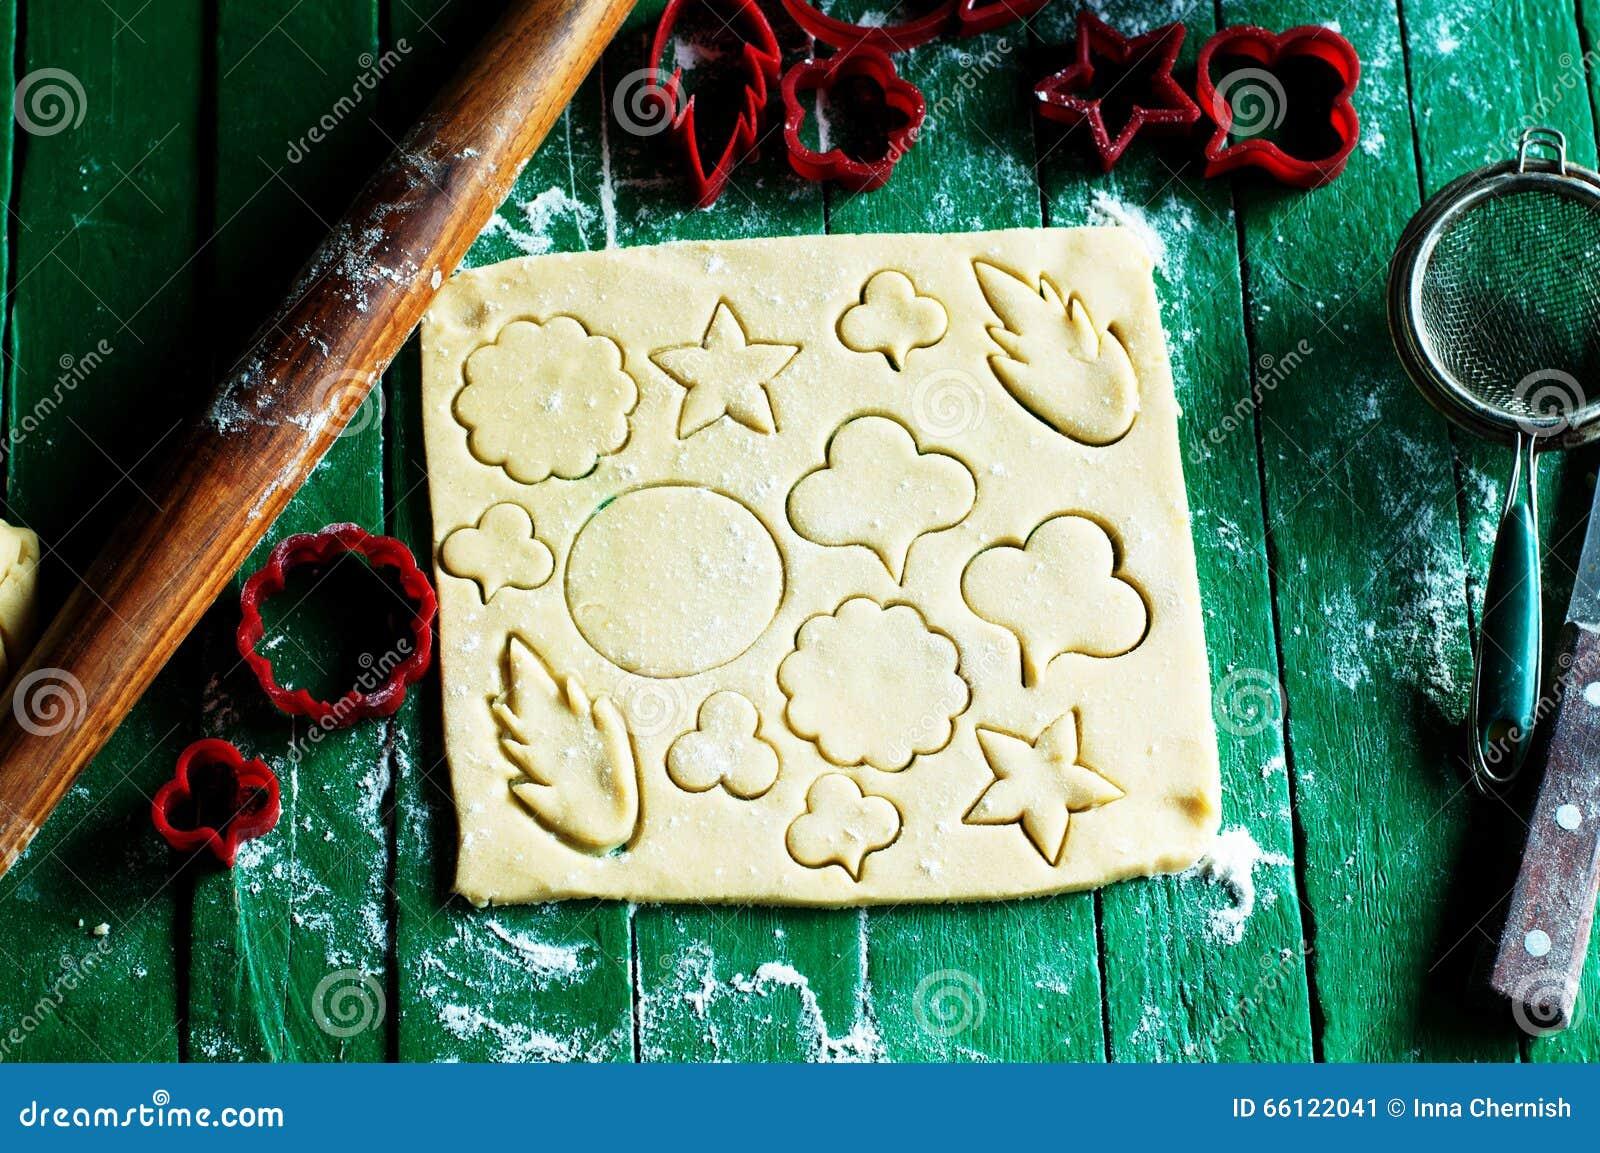 Baking Ingredients Clipart Cookies Baking Wood In...